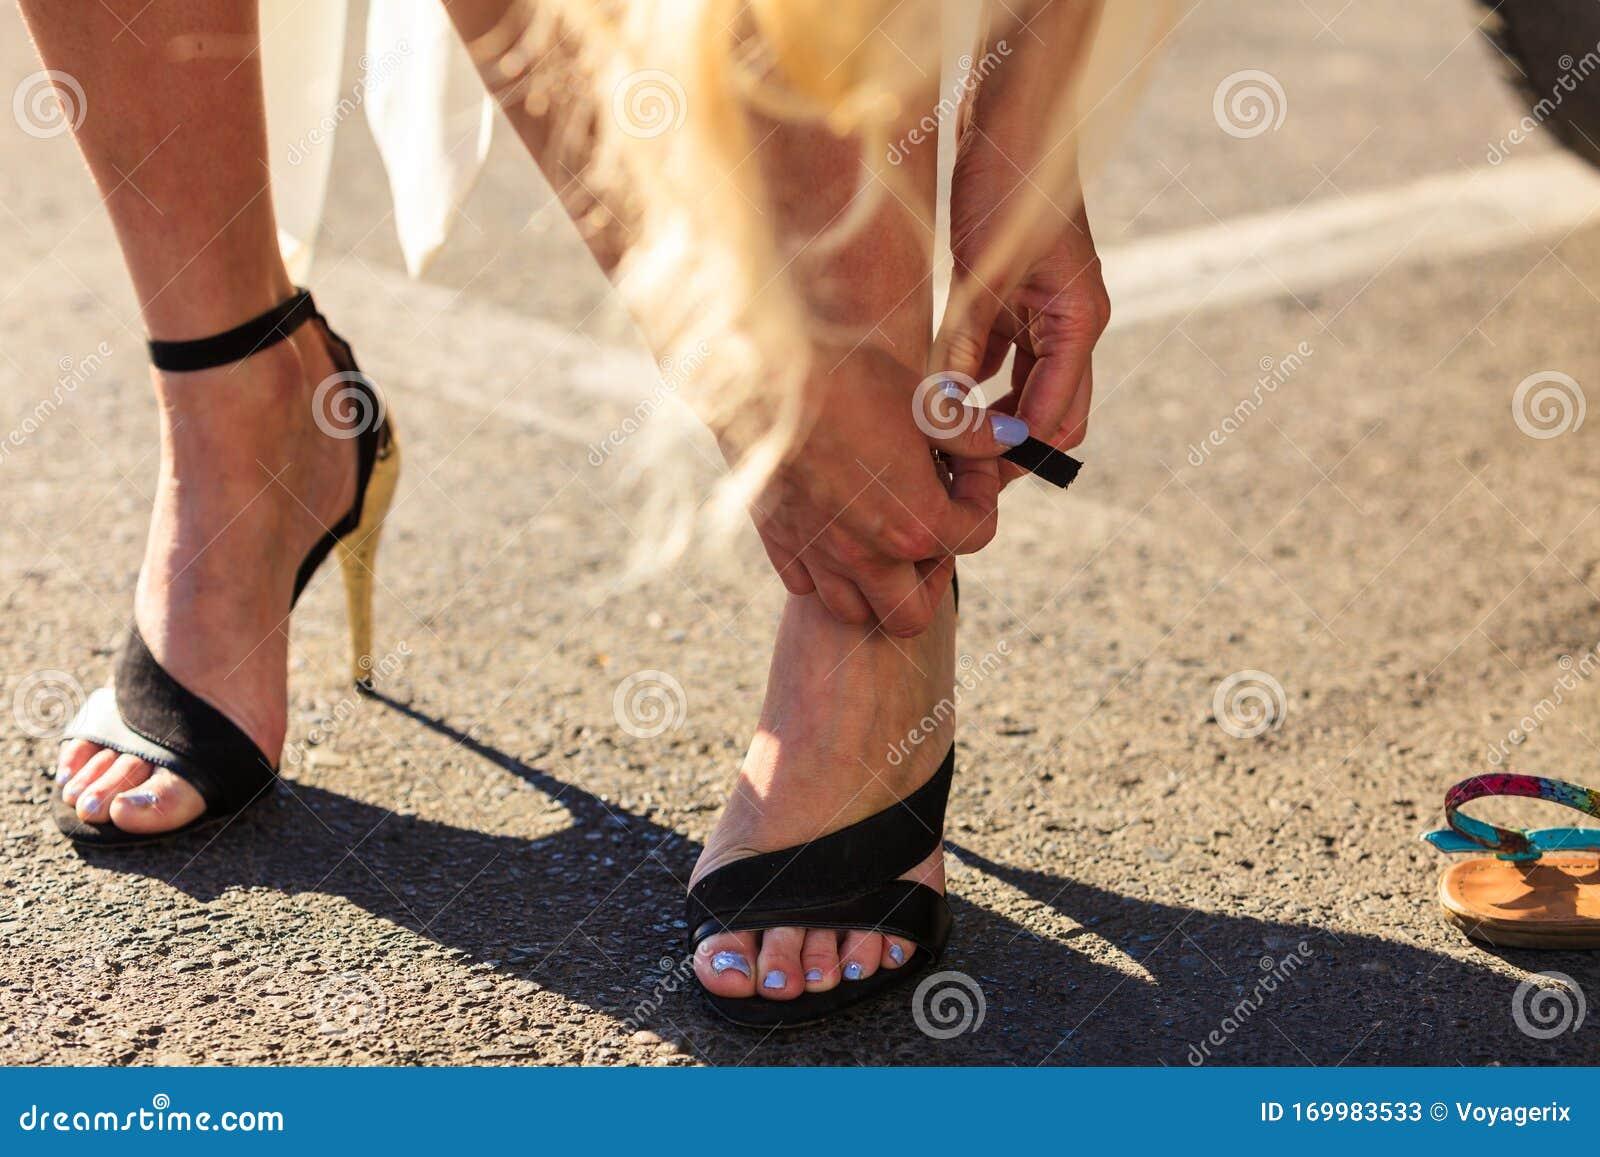 Kobiece stopy Stopy polskich